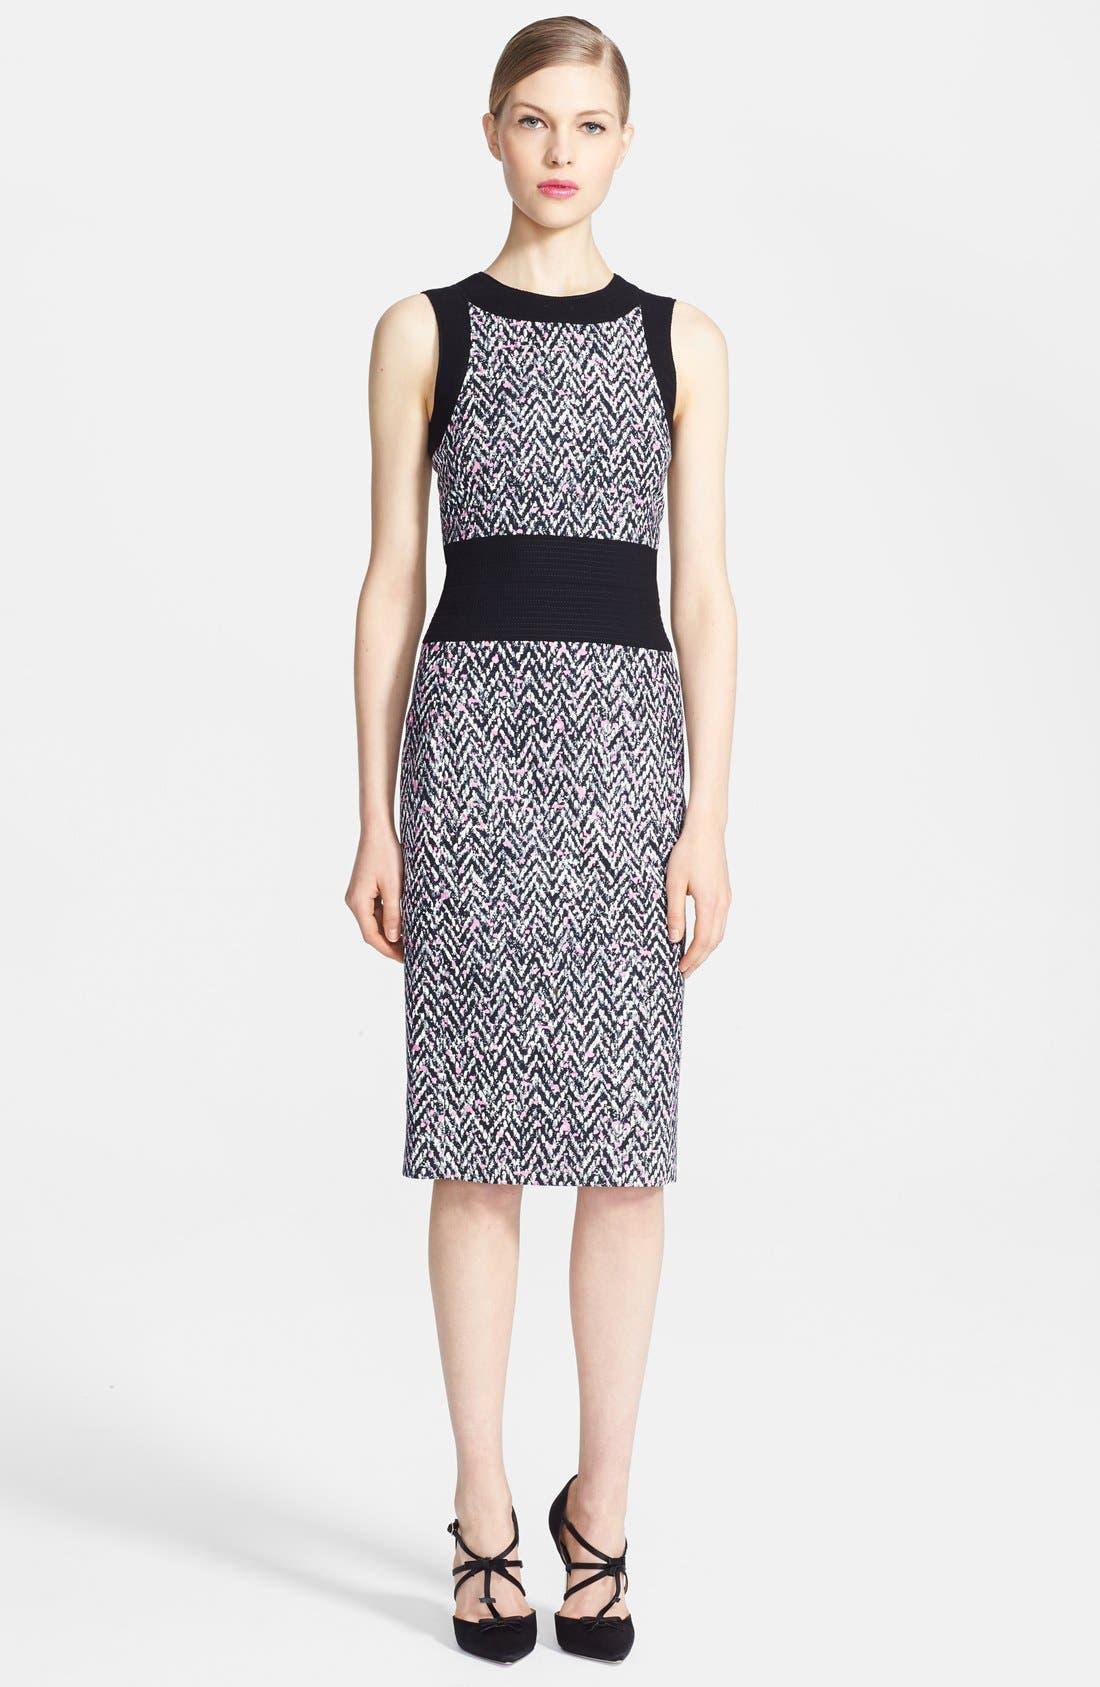 Alternate Image 1 Selected - Oscar de la Renta Tweed Pencil Dress